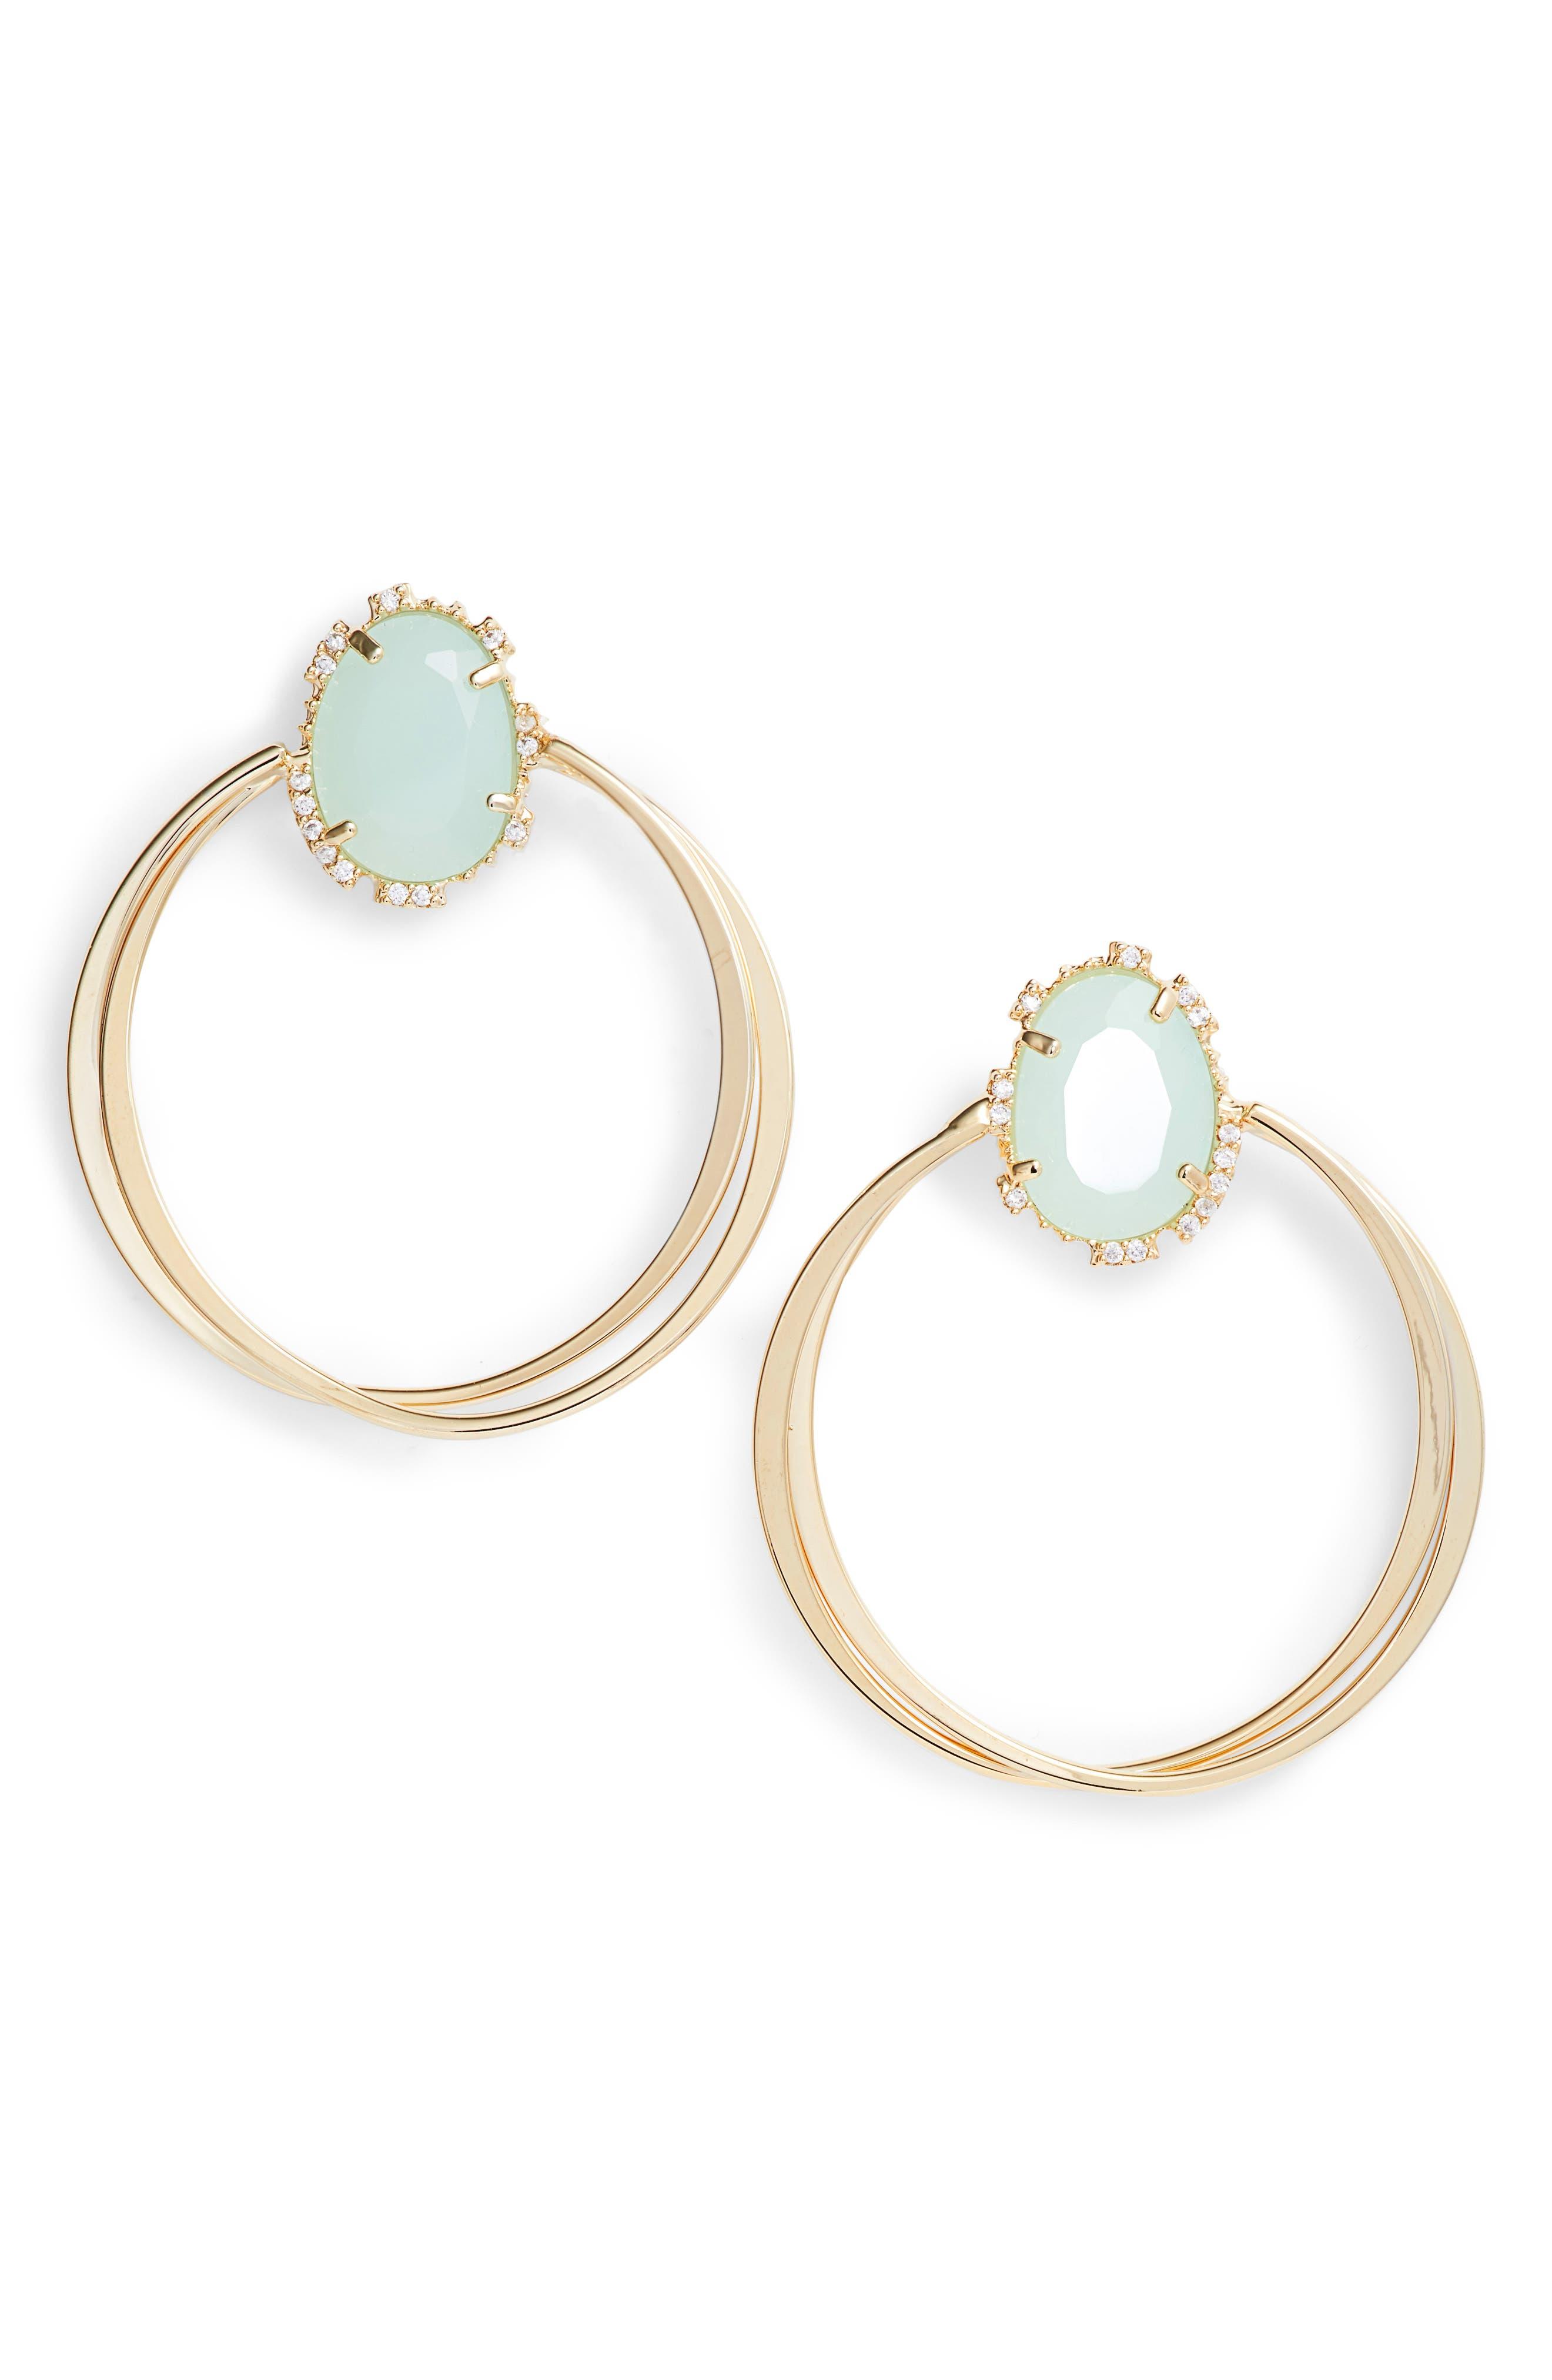 SEREFINA Crystal Hoop Earrings in Mint/ Gold